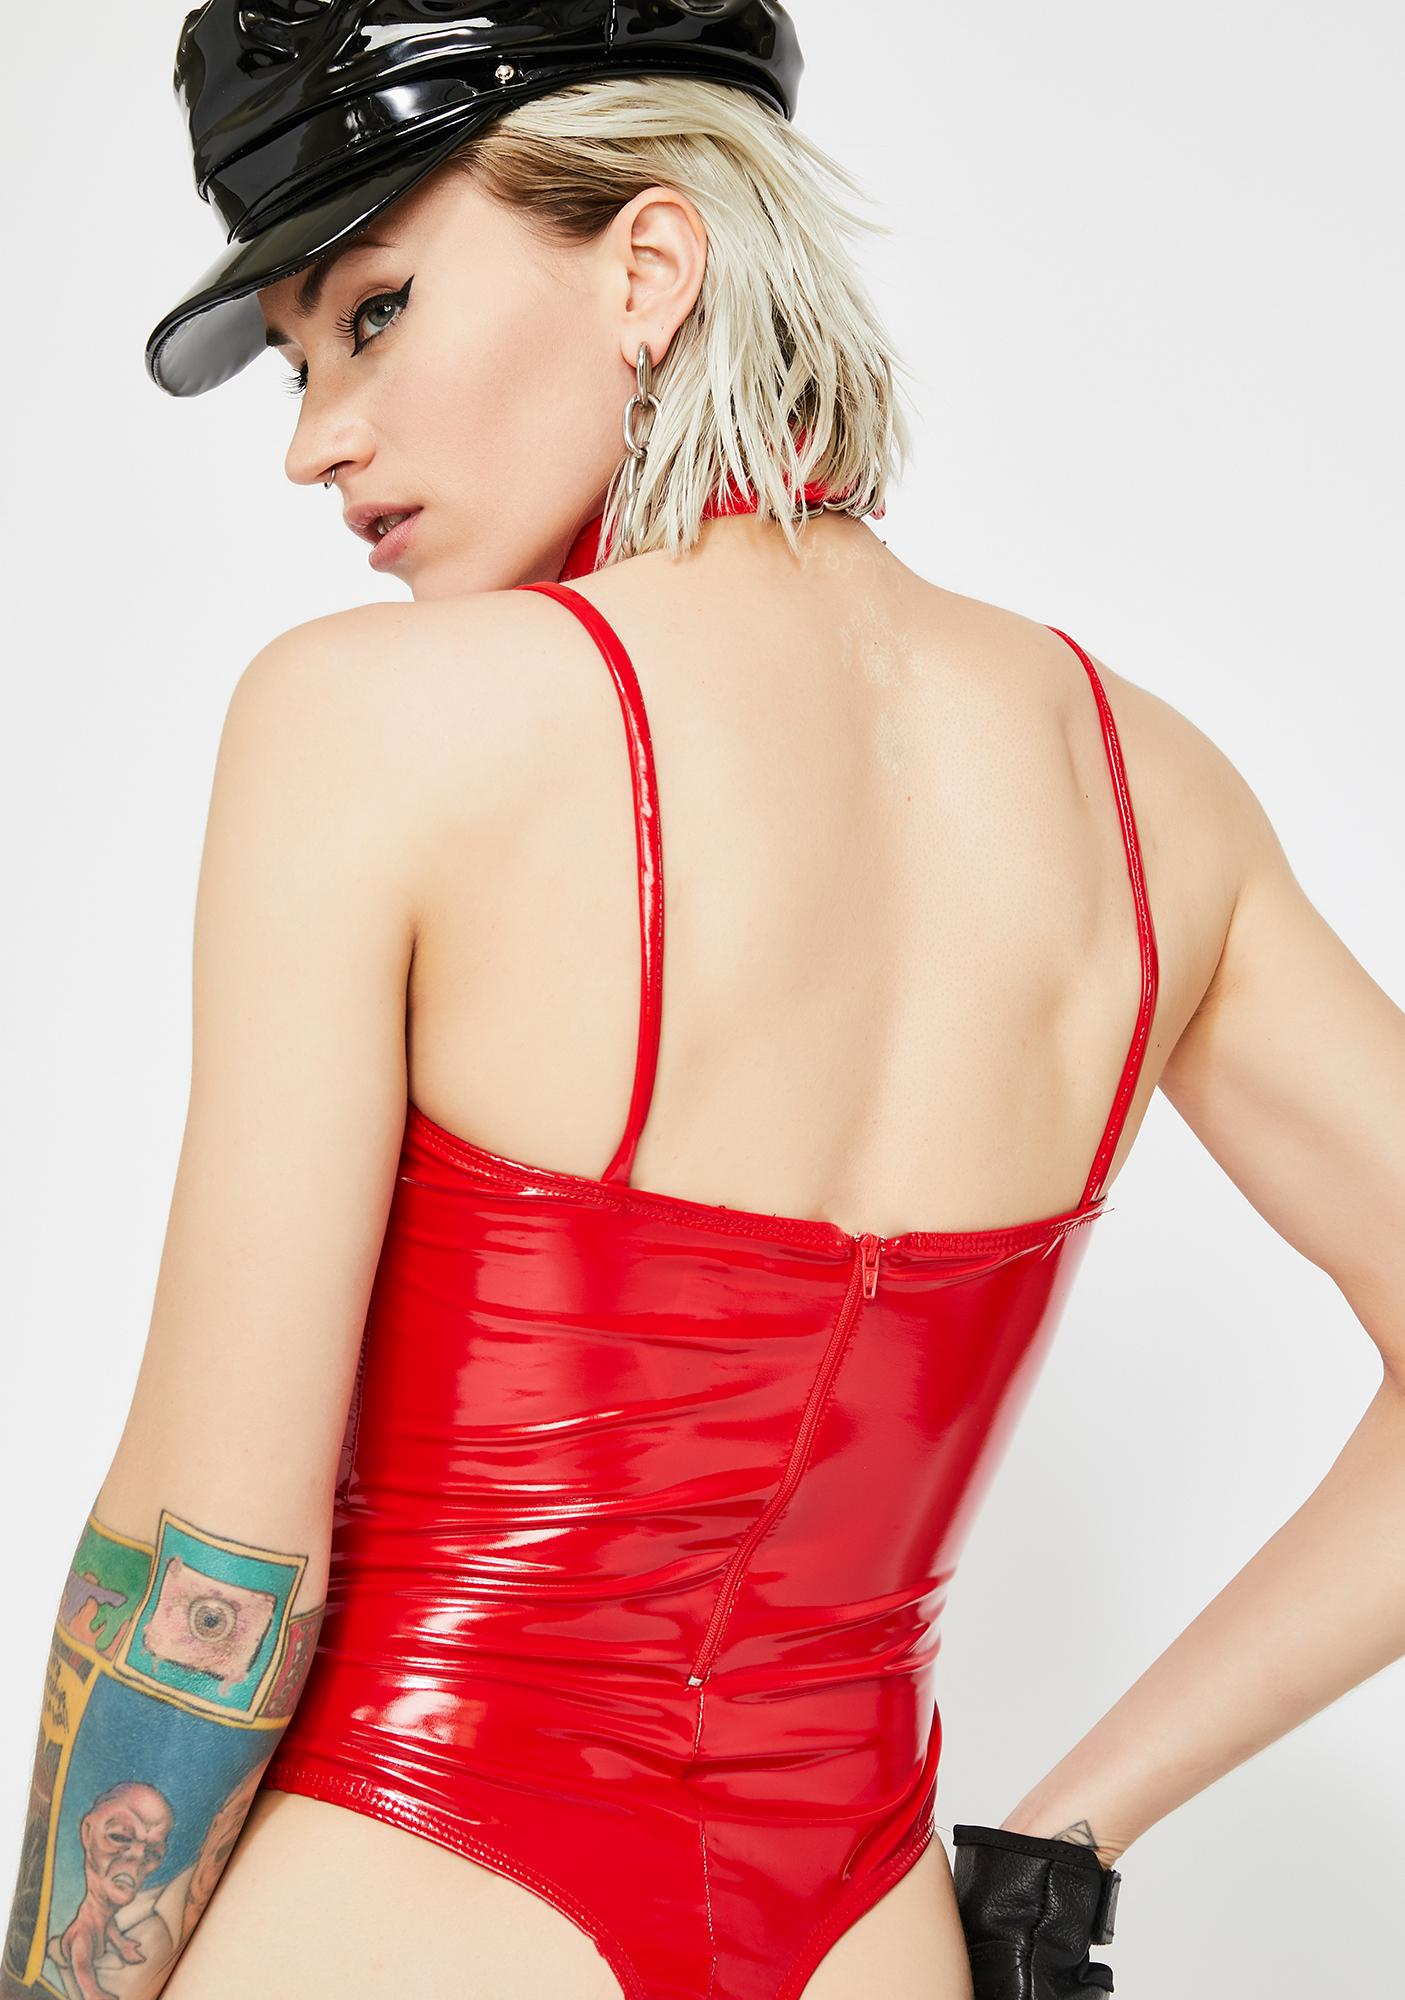 Flaming Villainous Vixen Vinyl Bodysuit